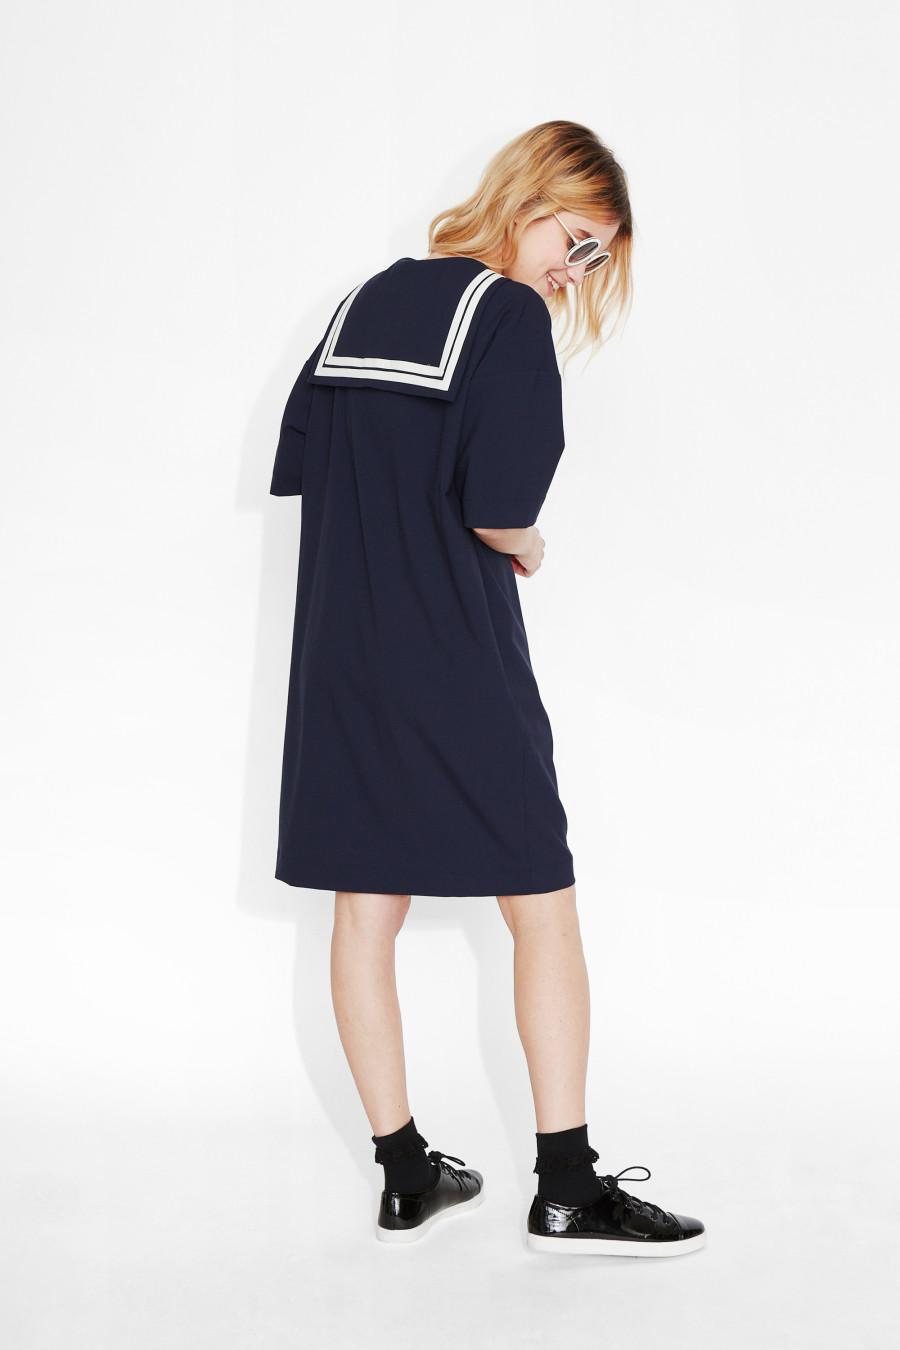 dress from monki